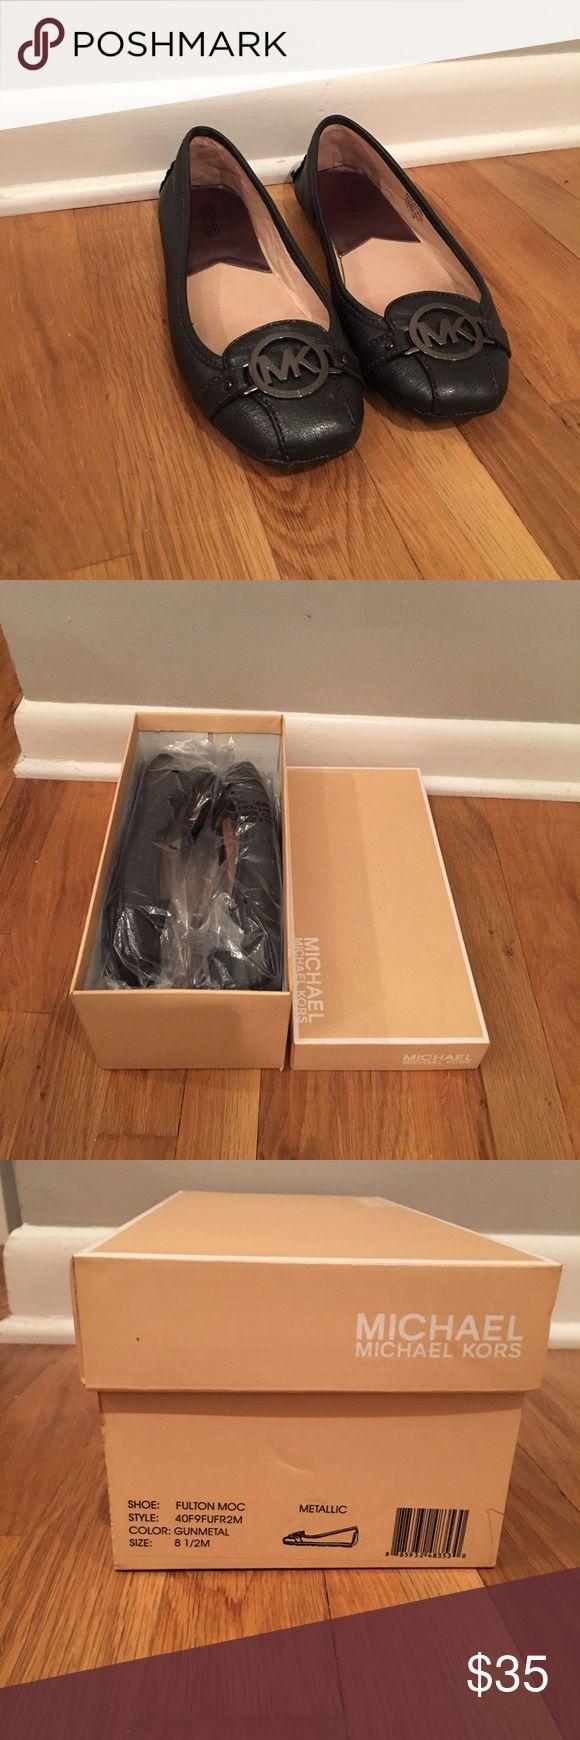 Michael Kors Flats Barely worn Michael Kors Flats still in original box and packaging. MICHAEL Michael Kors Shoes Flats & Loafers